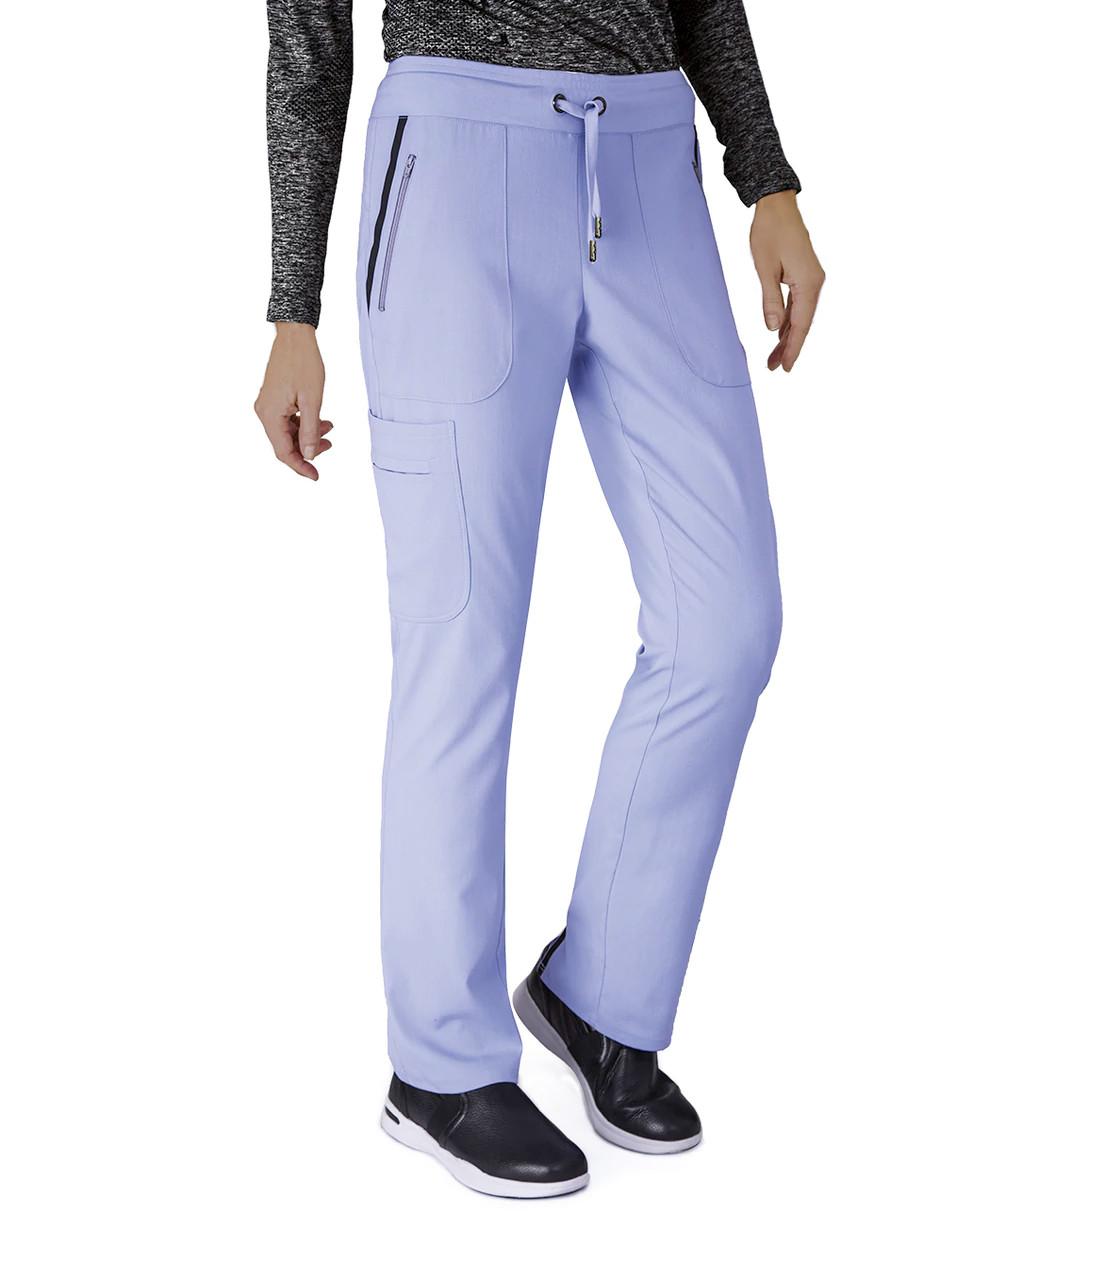 fba20f26e02 (7228T) Grey's Anatomy Impact Scrubs - Elevate 6 Pocket Cargo Pant (Tall)  ...